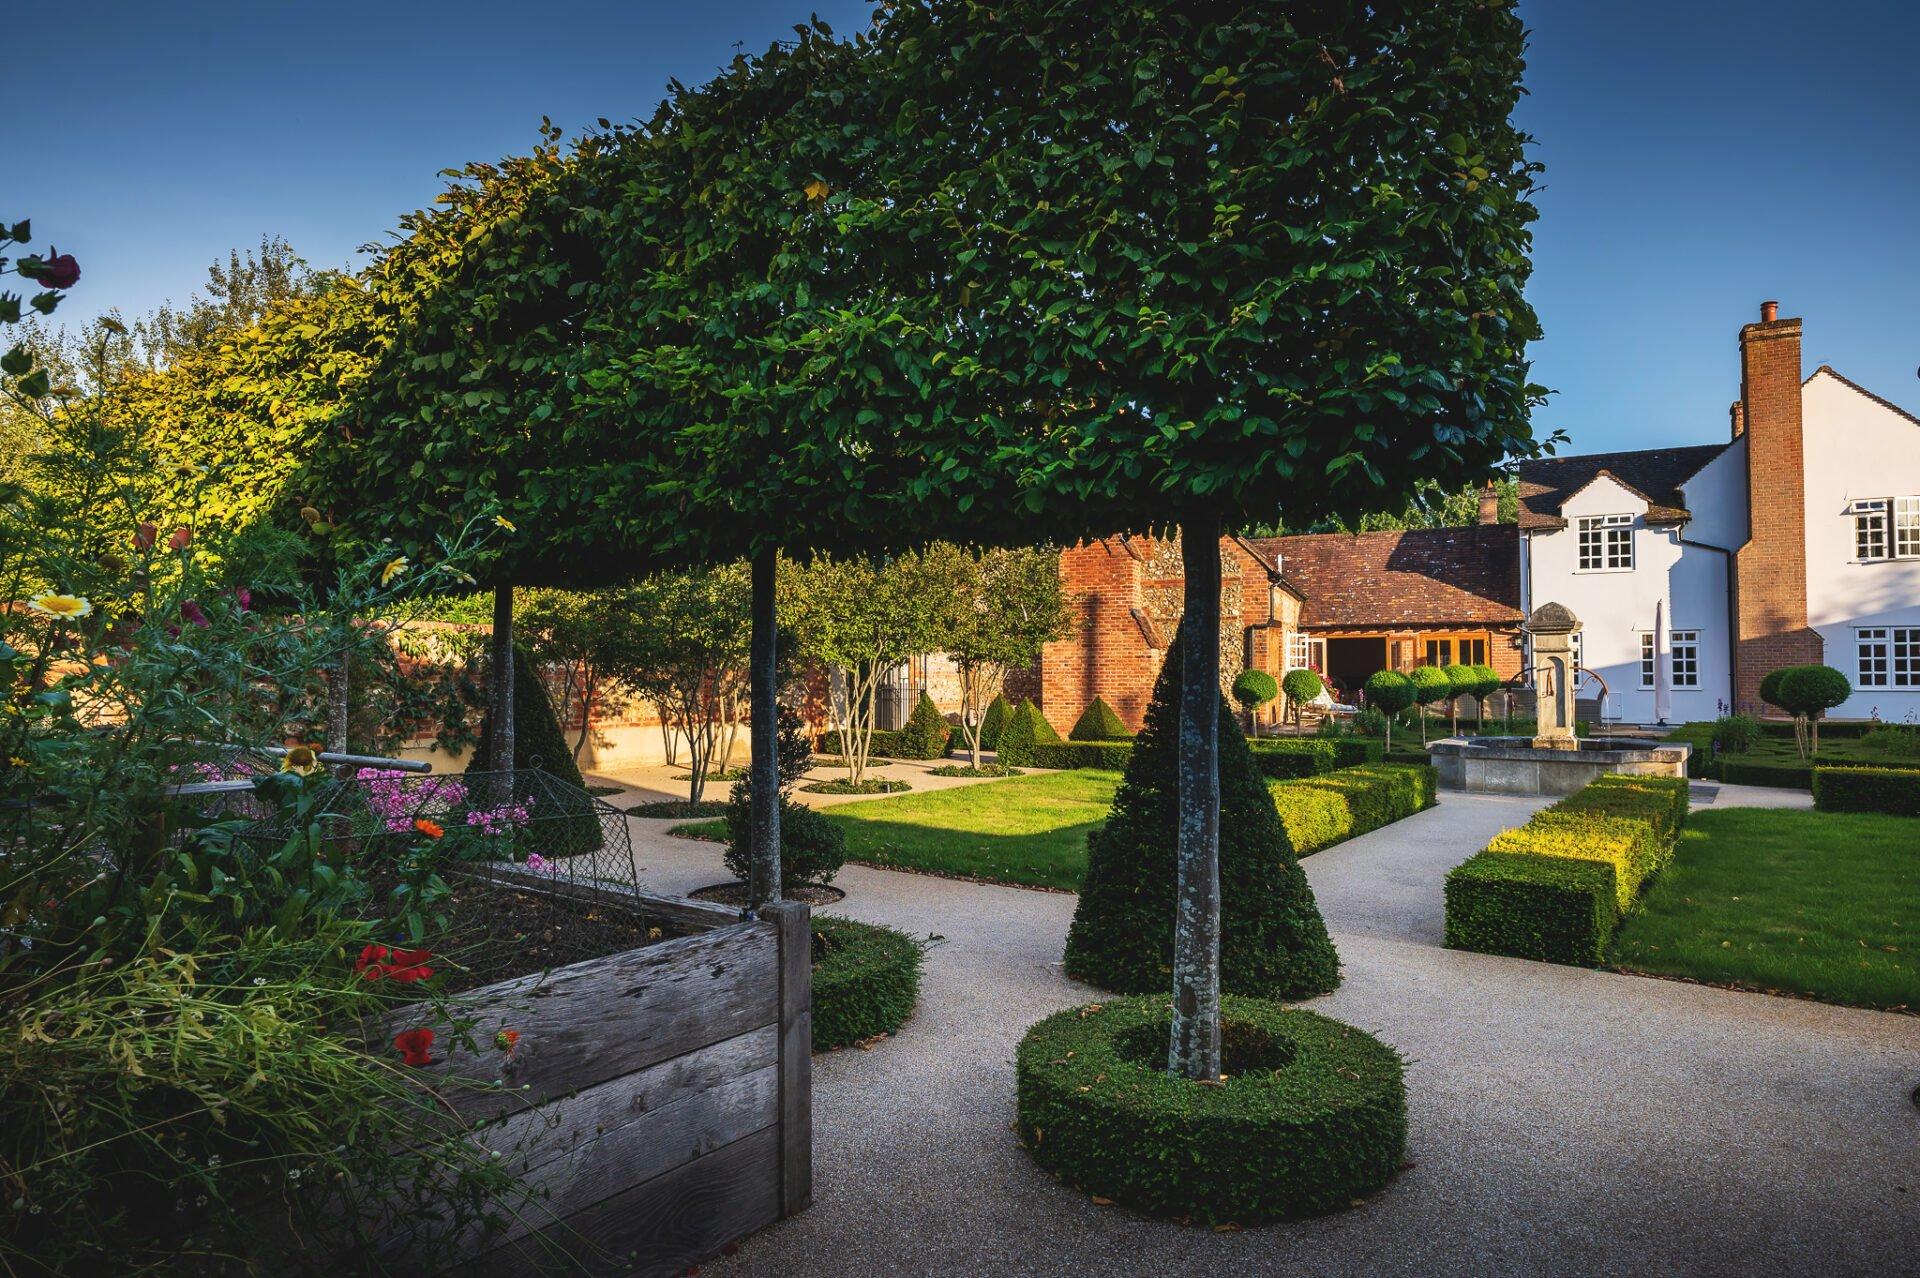 Pleached trees & French style garden by Jo Alderson Phillips